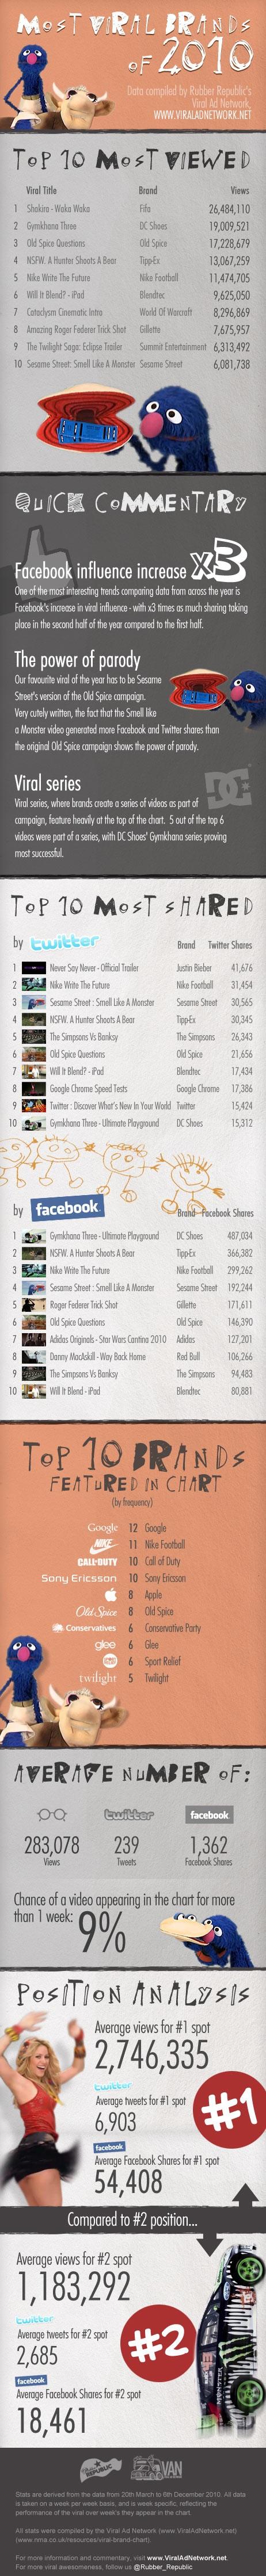 Most_viral_brands_2010